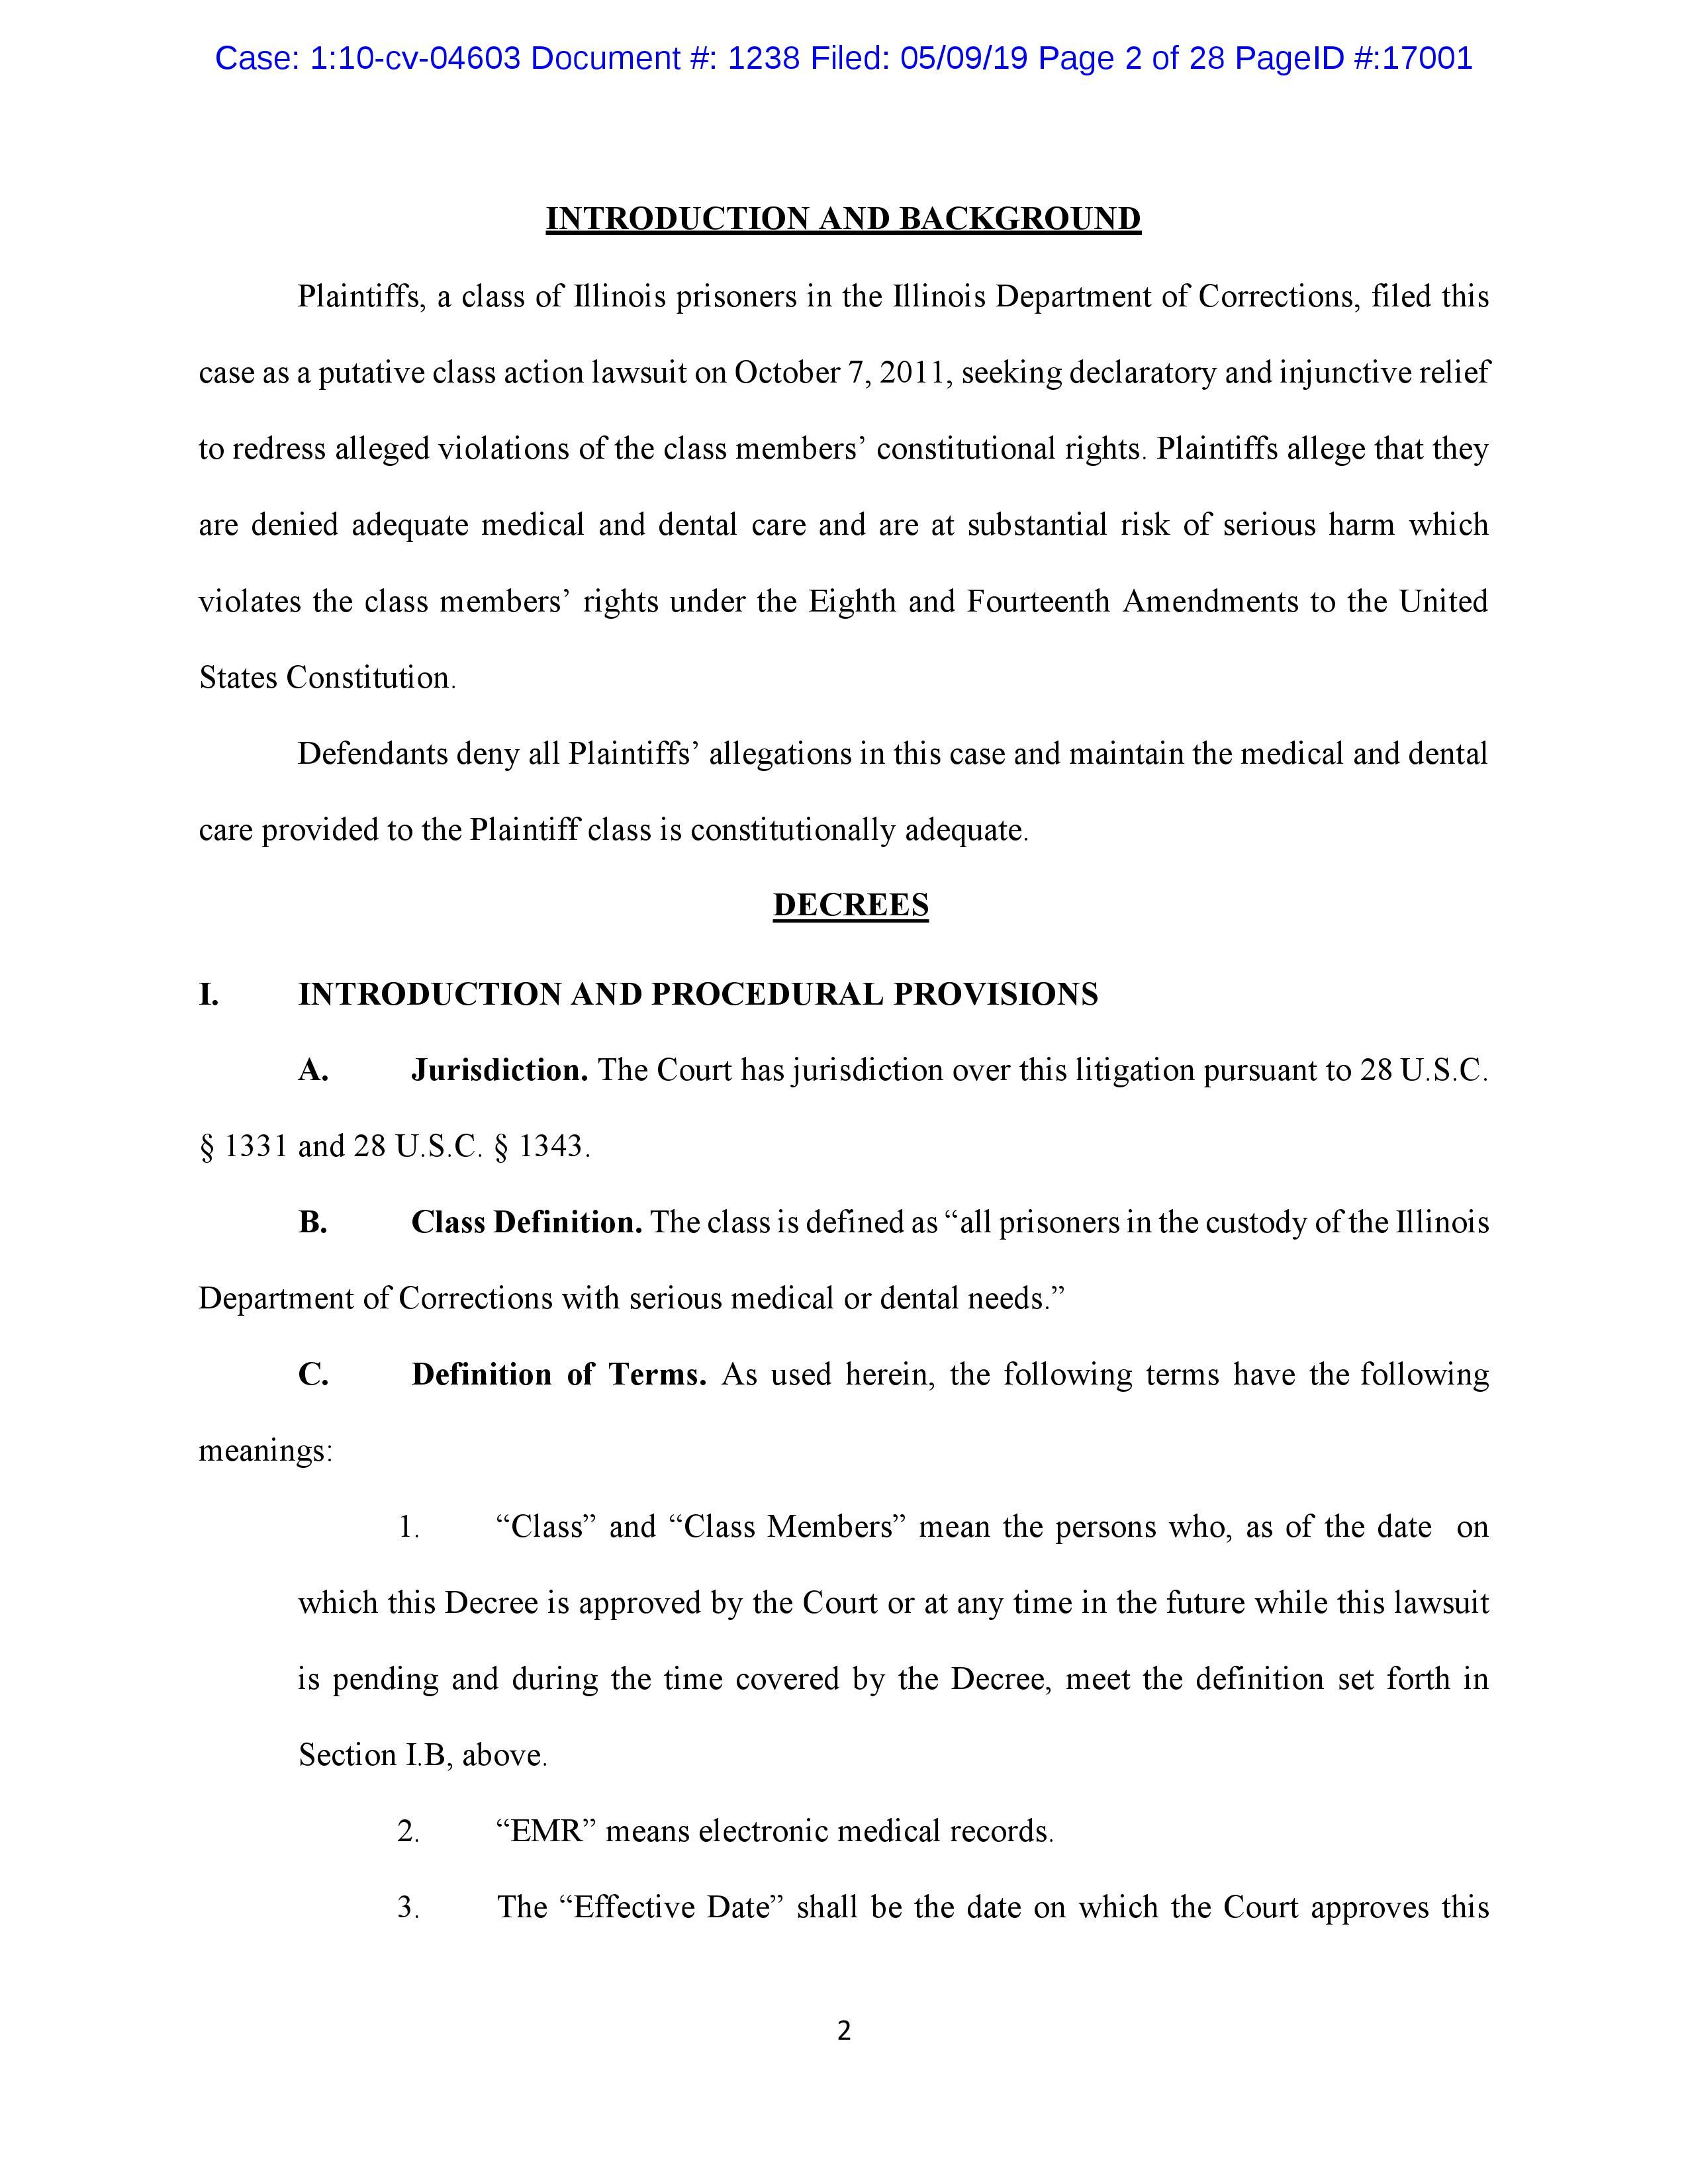 Lippert v. Baldwin: Consent Decree